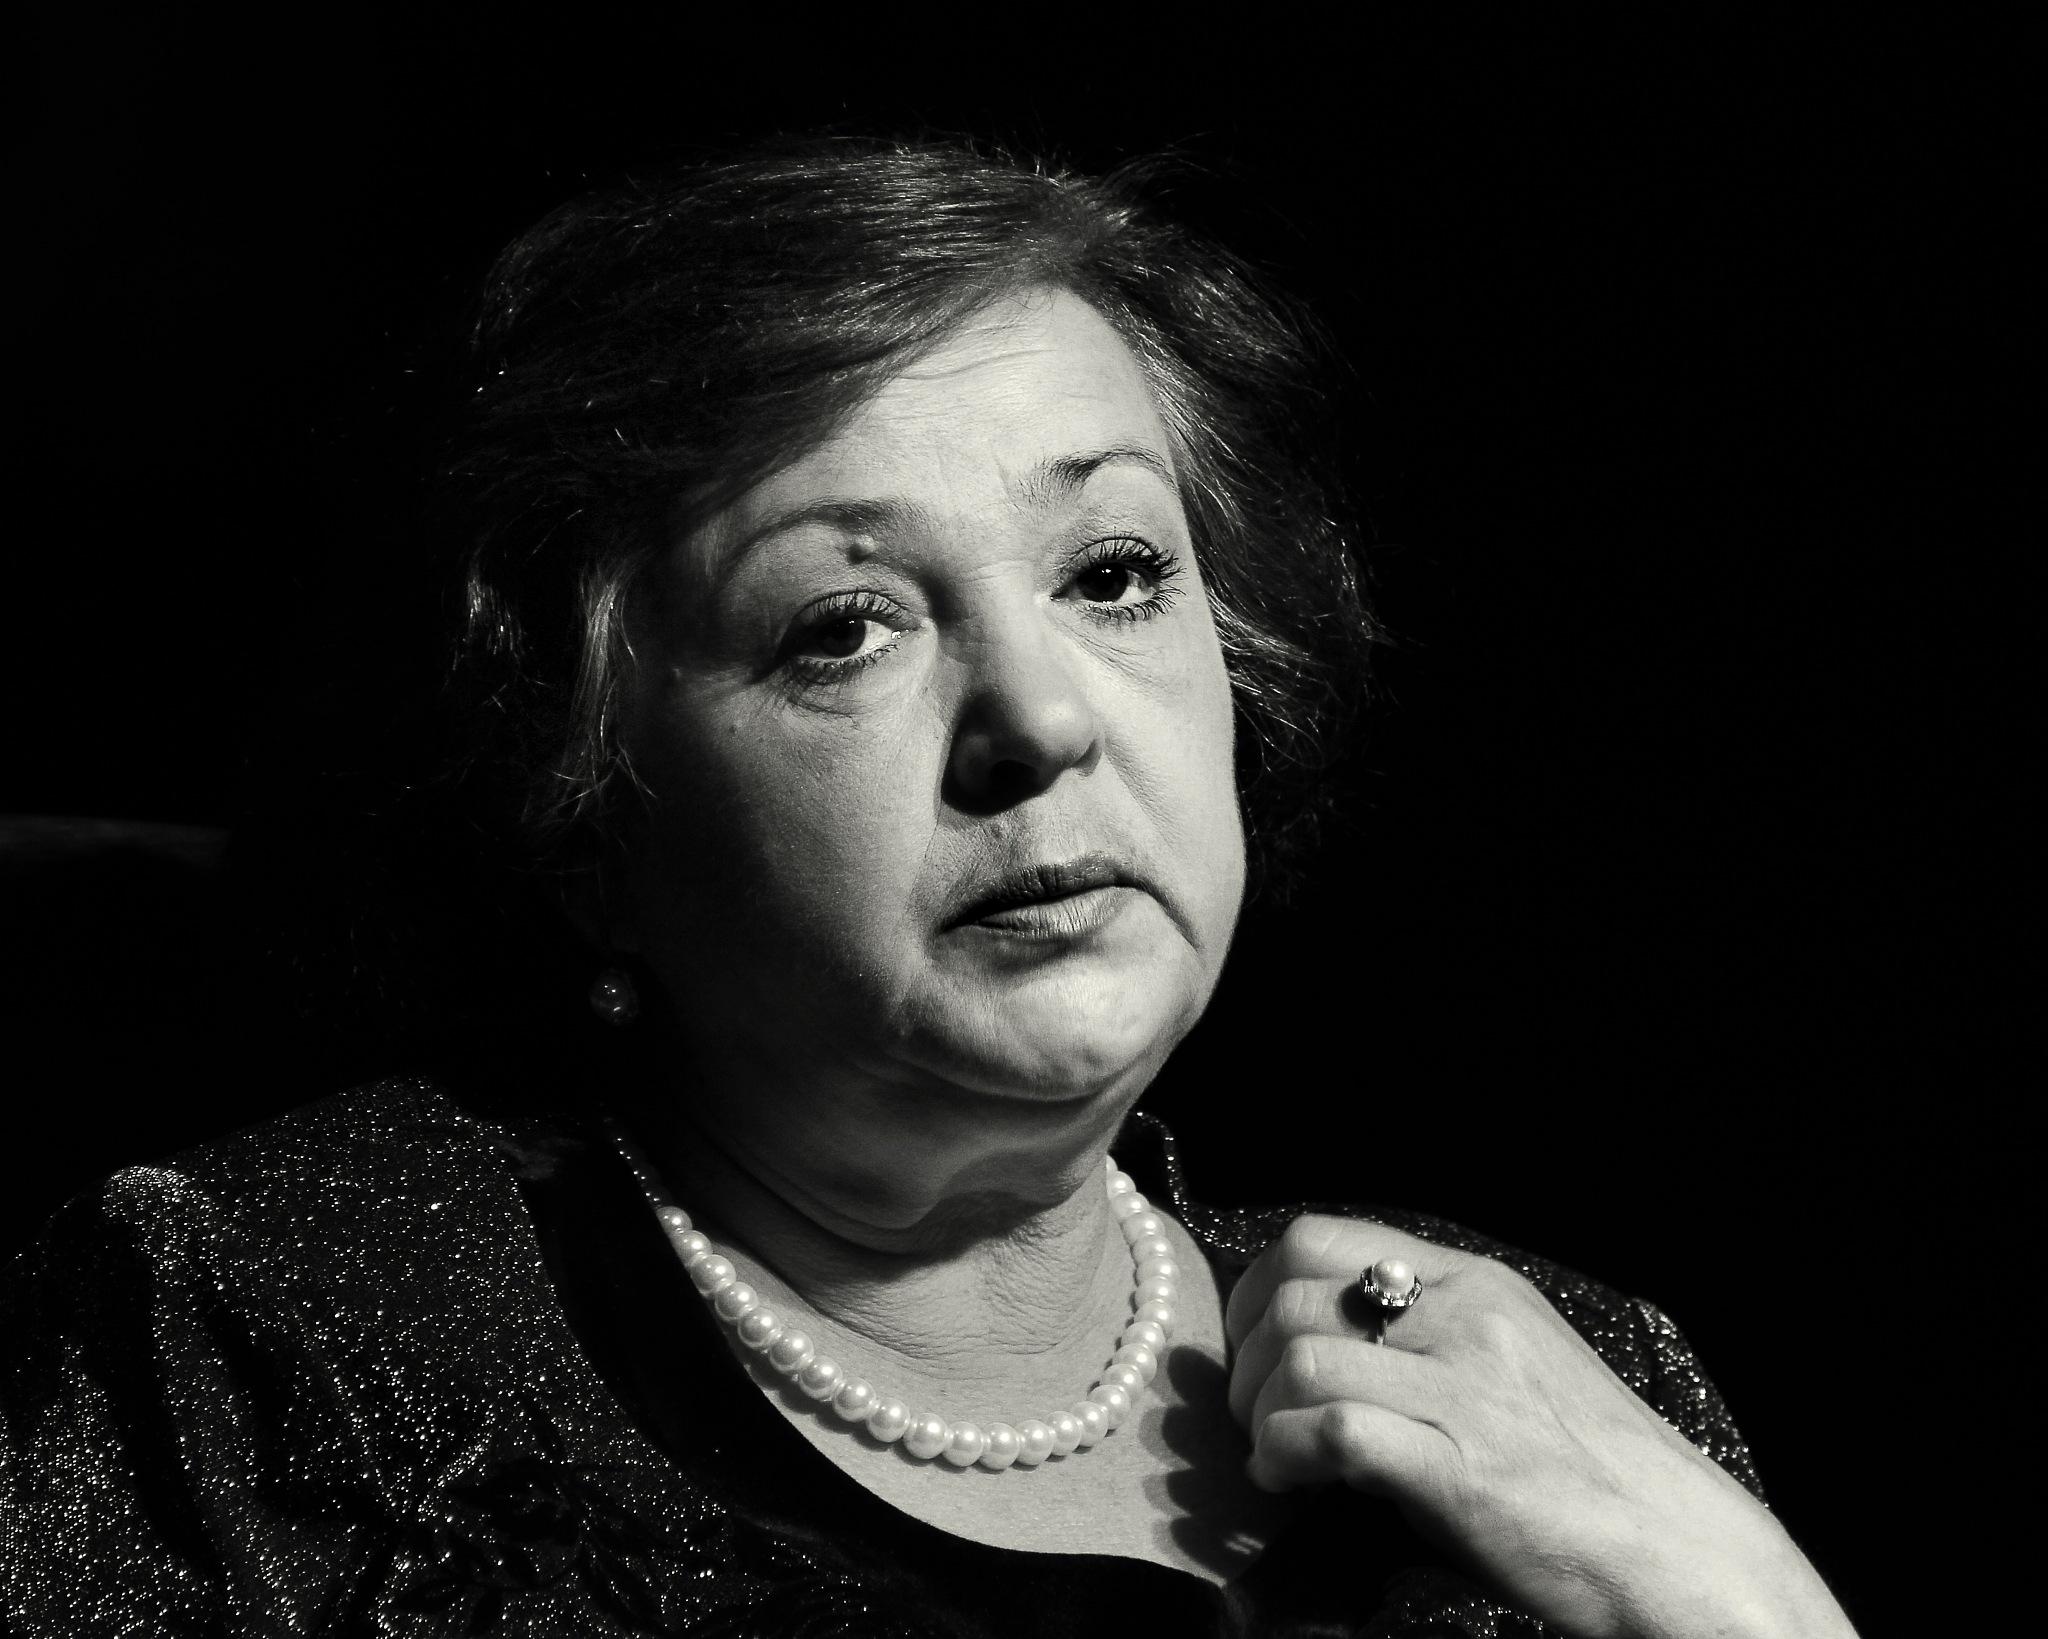 Actress Irina Janko by Сергей Юрьев